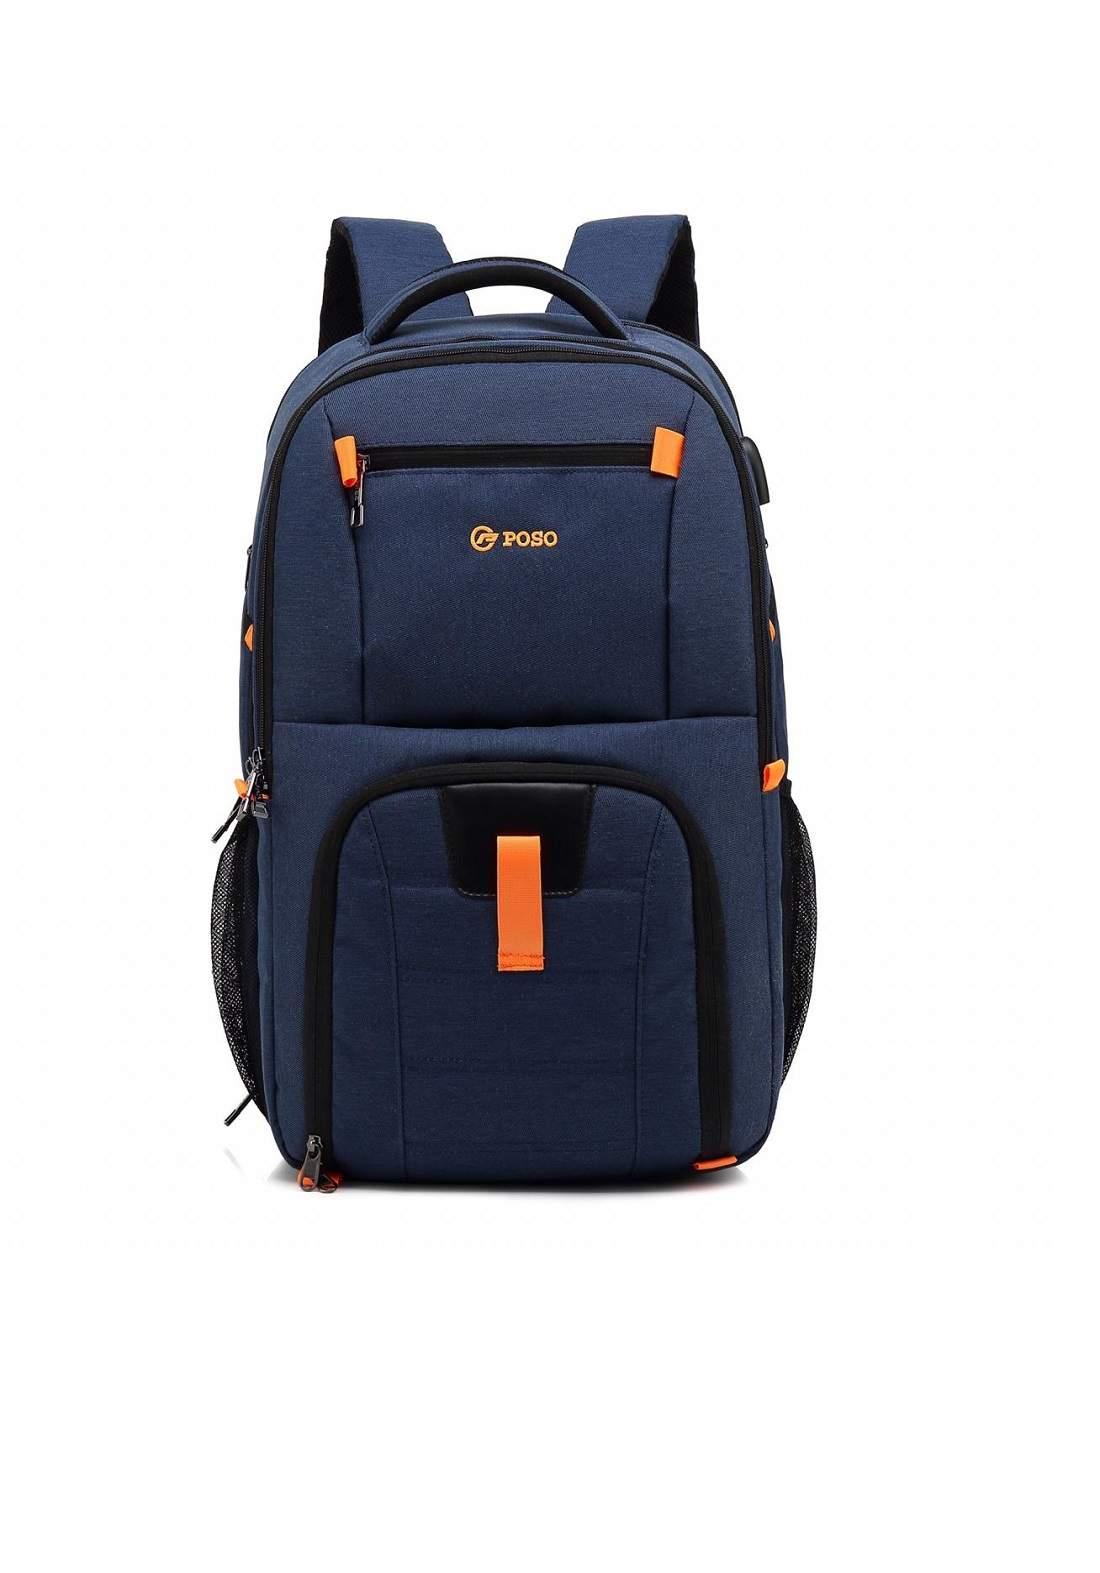 Poso PS-501 Laptop Bag-Blue حقيبة لابتوب